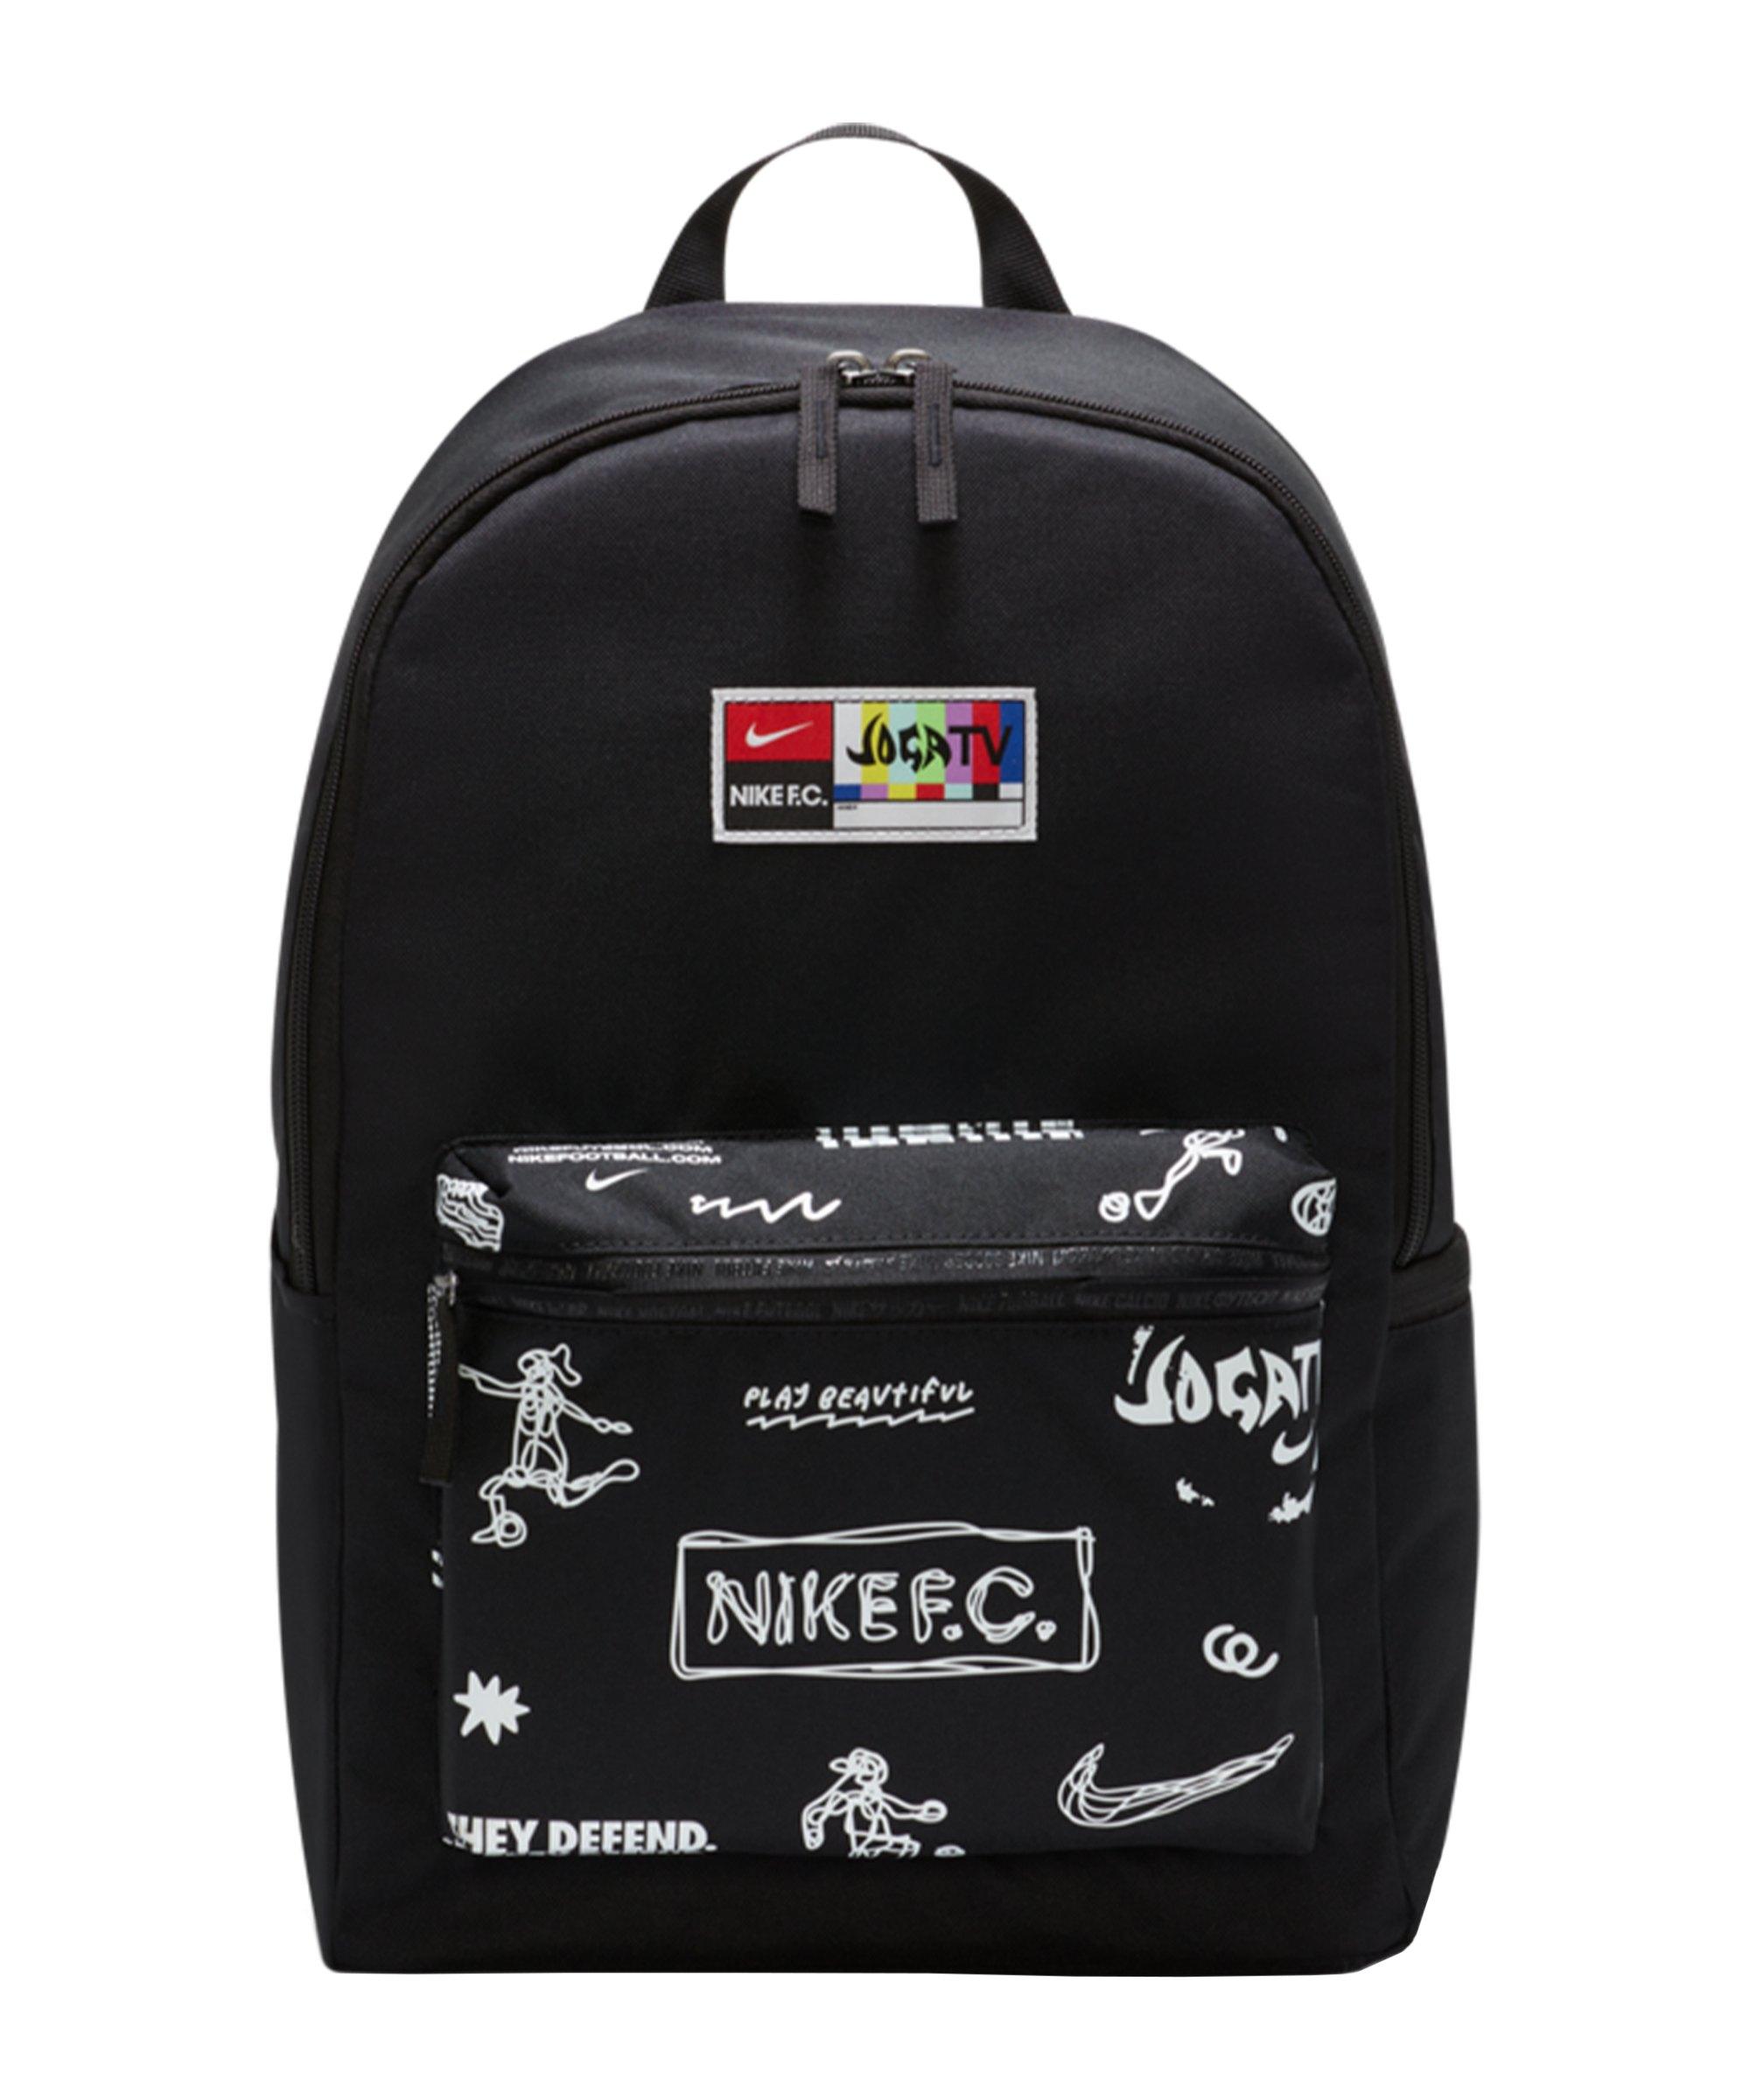 Nike F.C. Rucksack Joga Bonito Schwarz F010 - schwarz